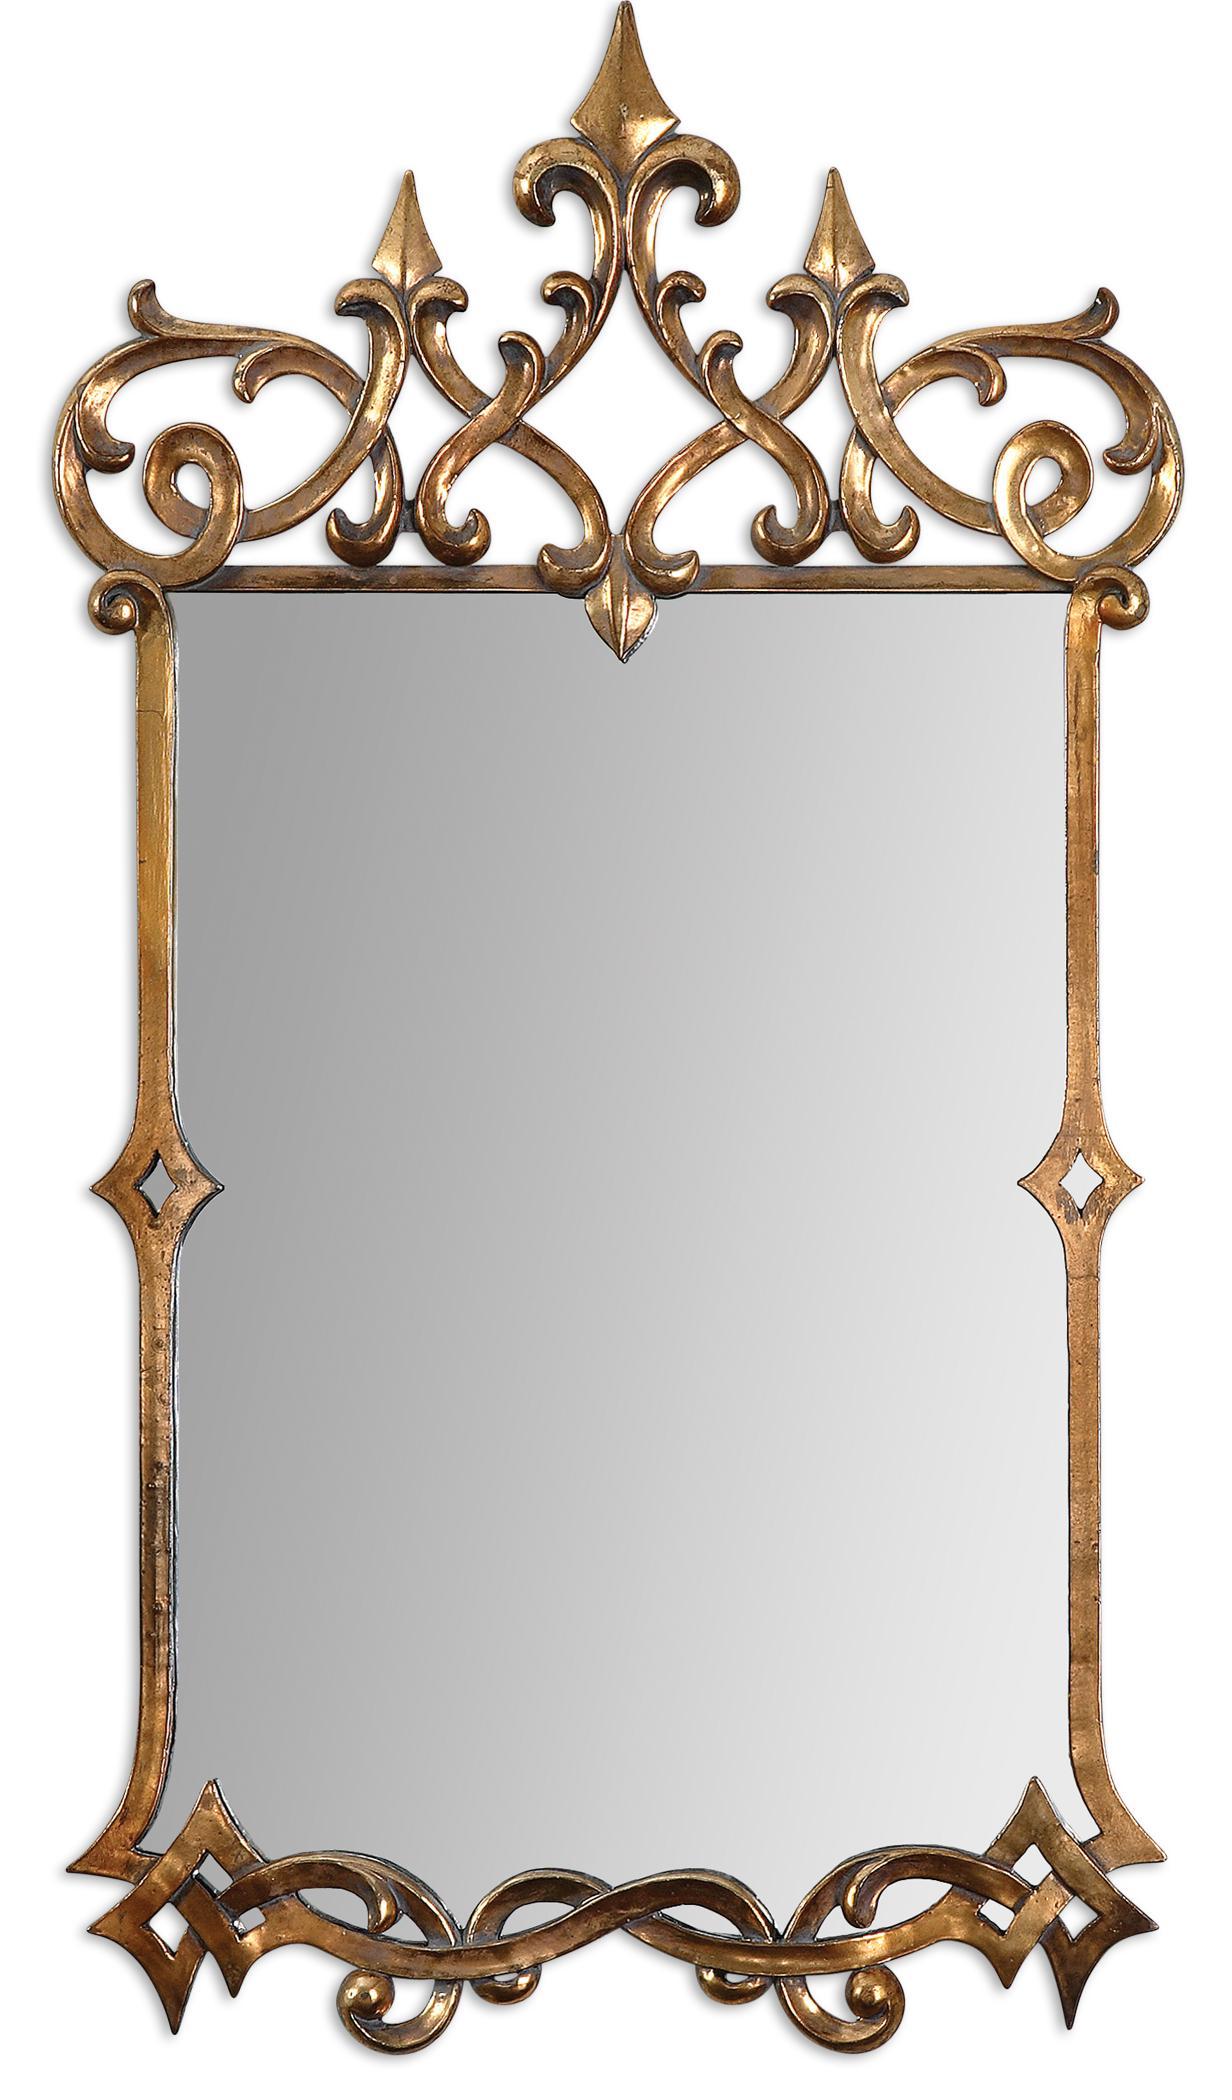 Uttermost Mirrors Mirandela Gold Mirror - Item Number: 12861